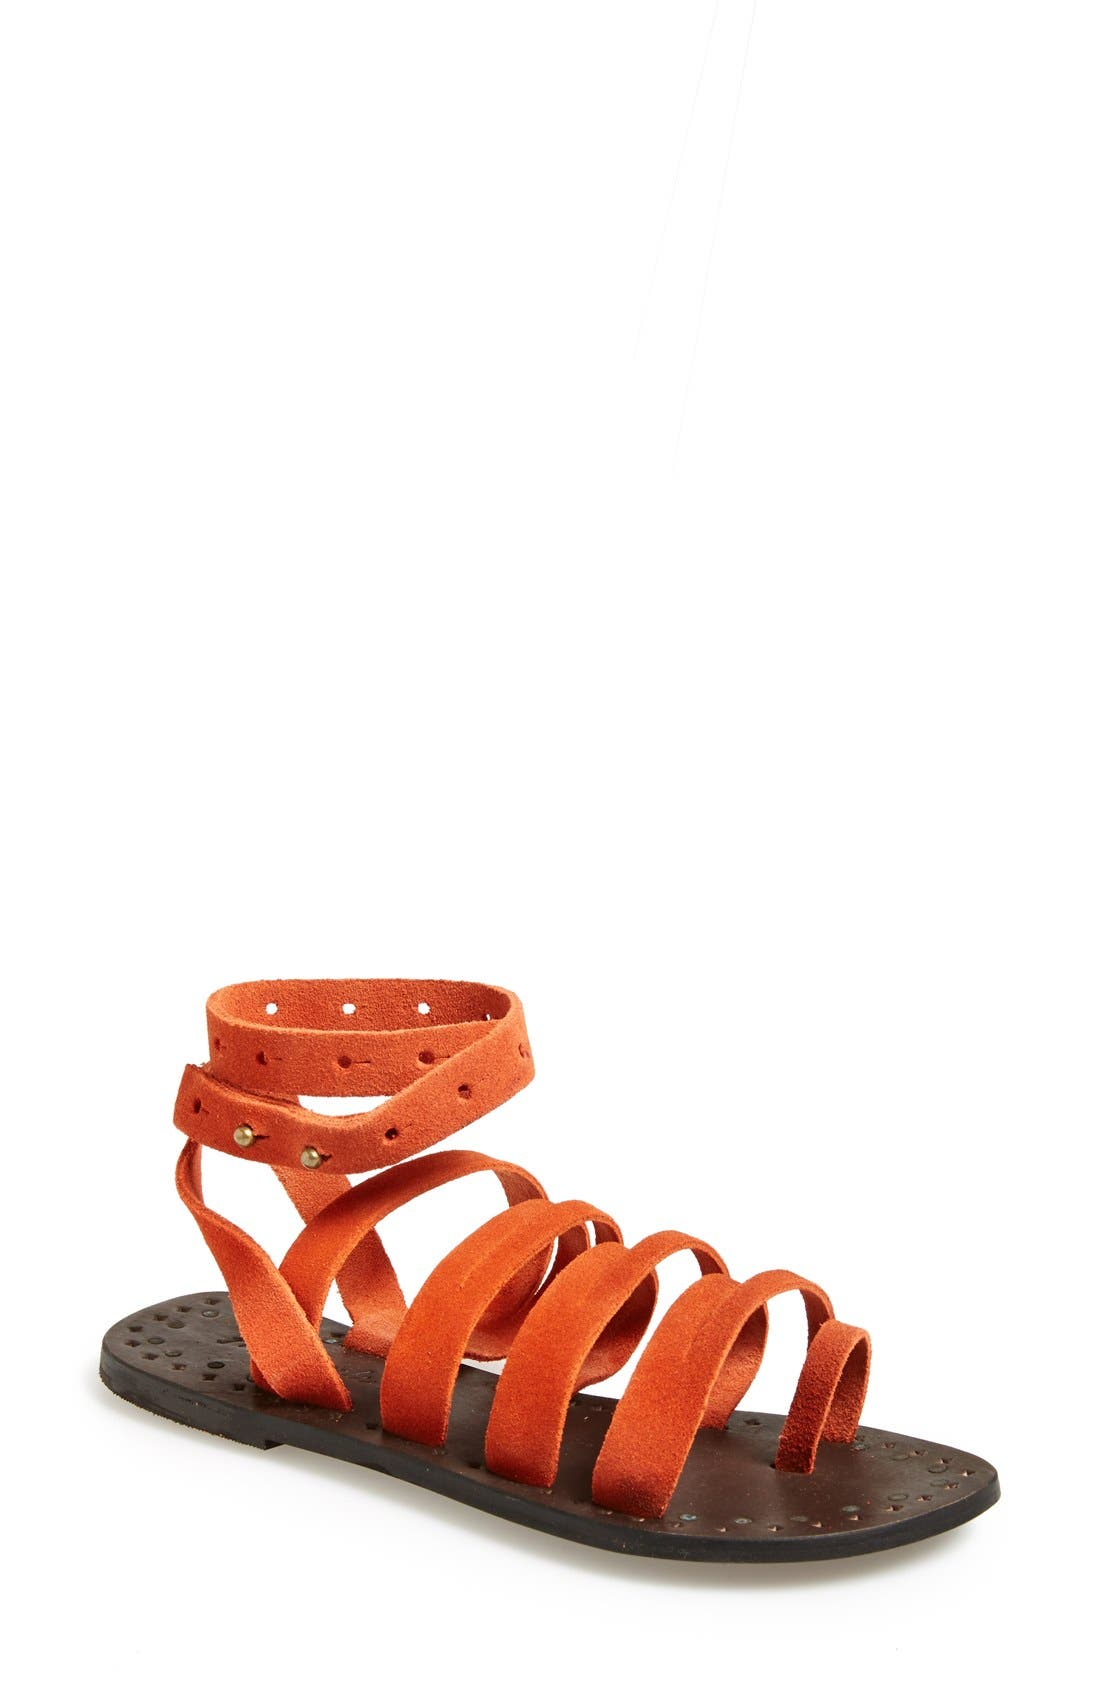 Main Image - Free People 'Sunever' Leather Gladiator Sandal (Women)